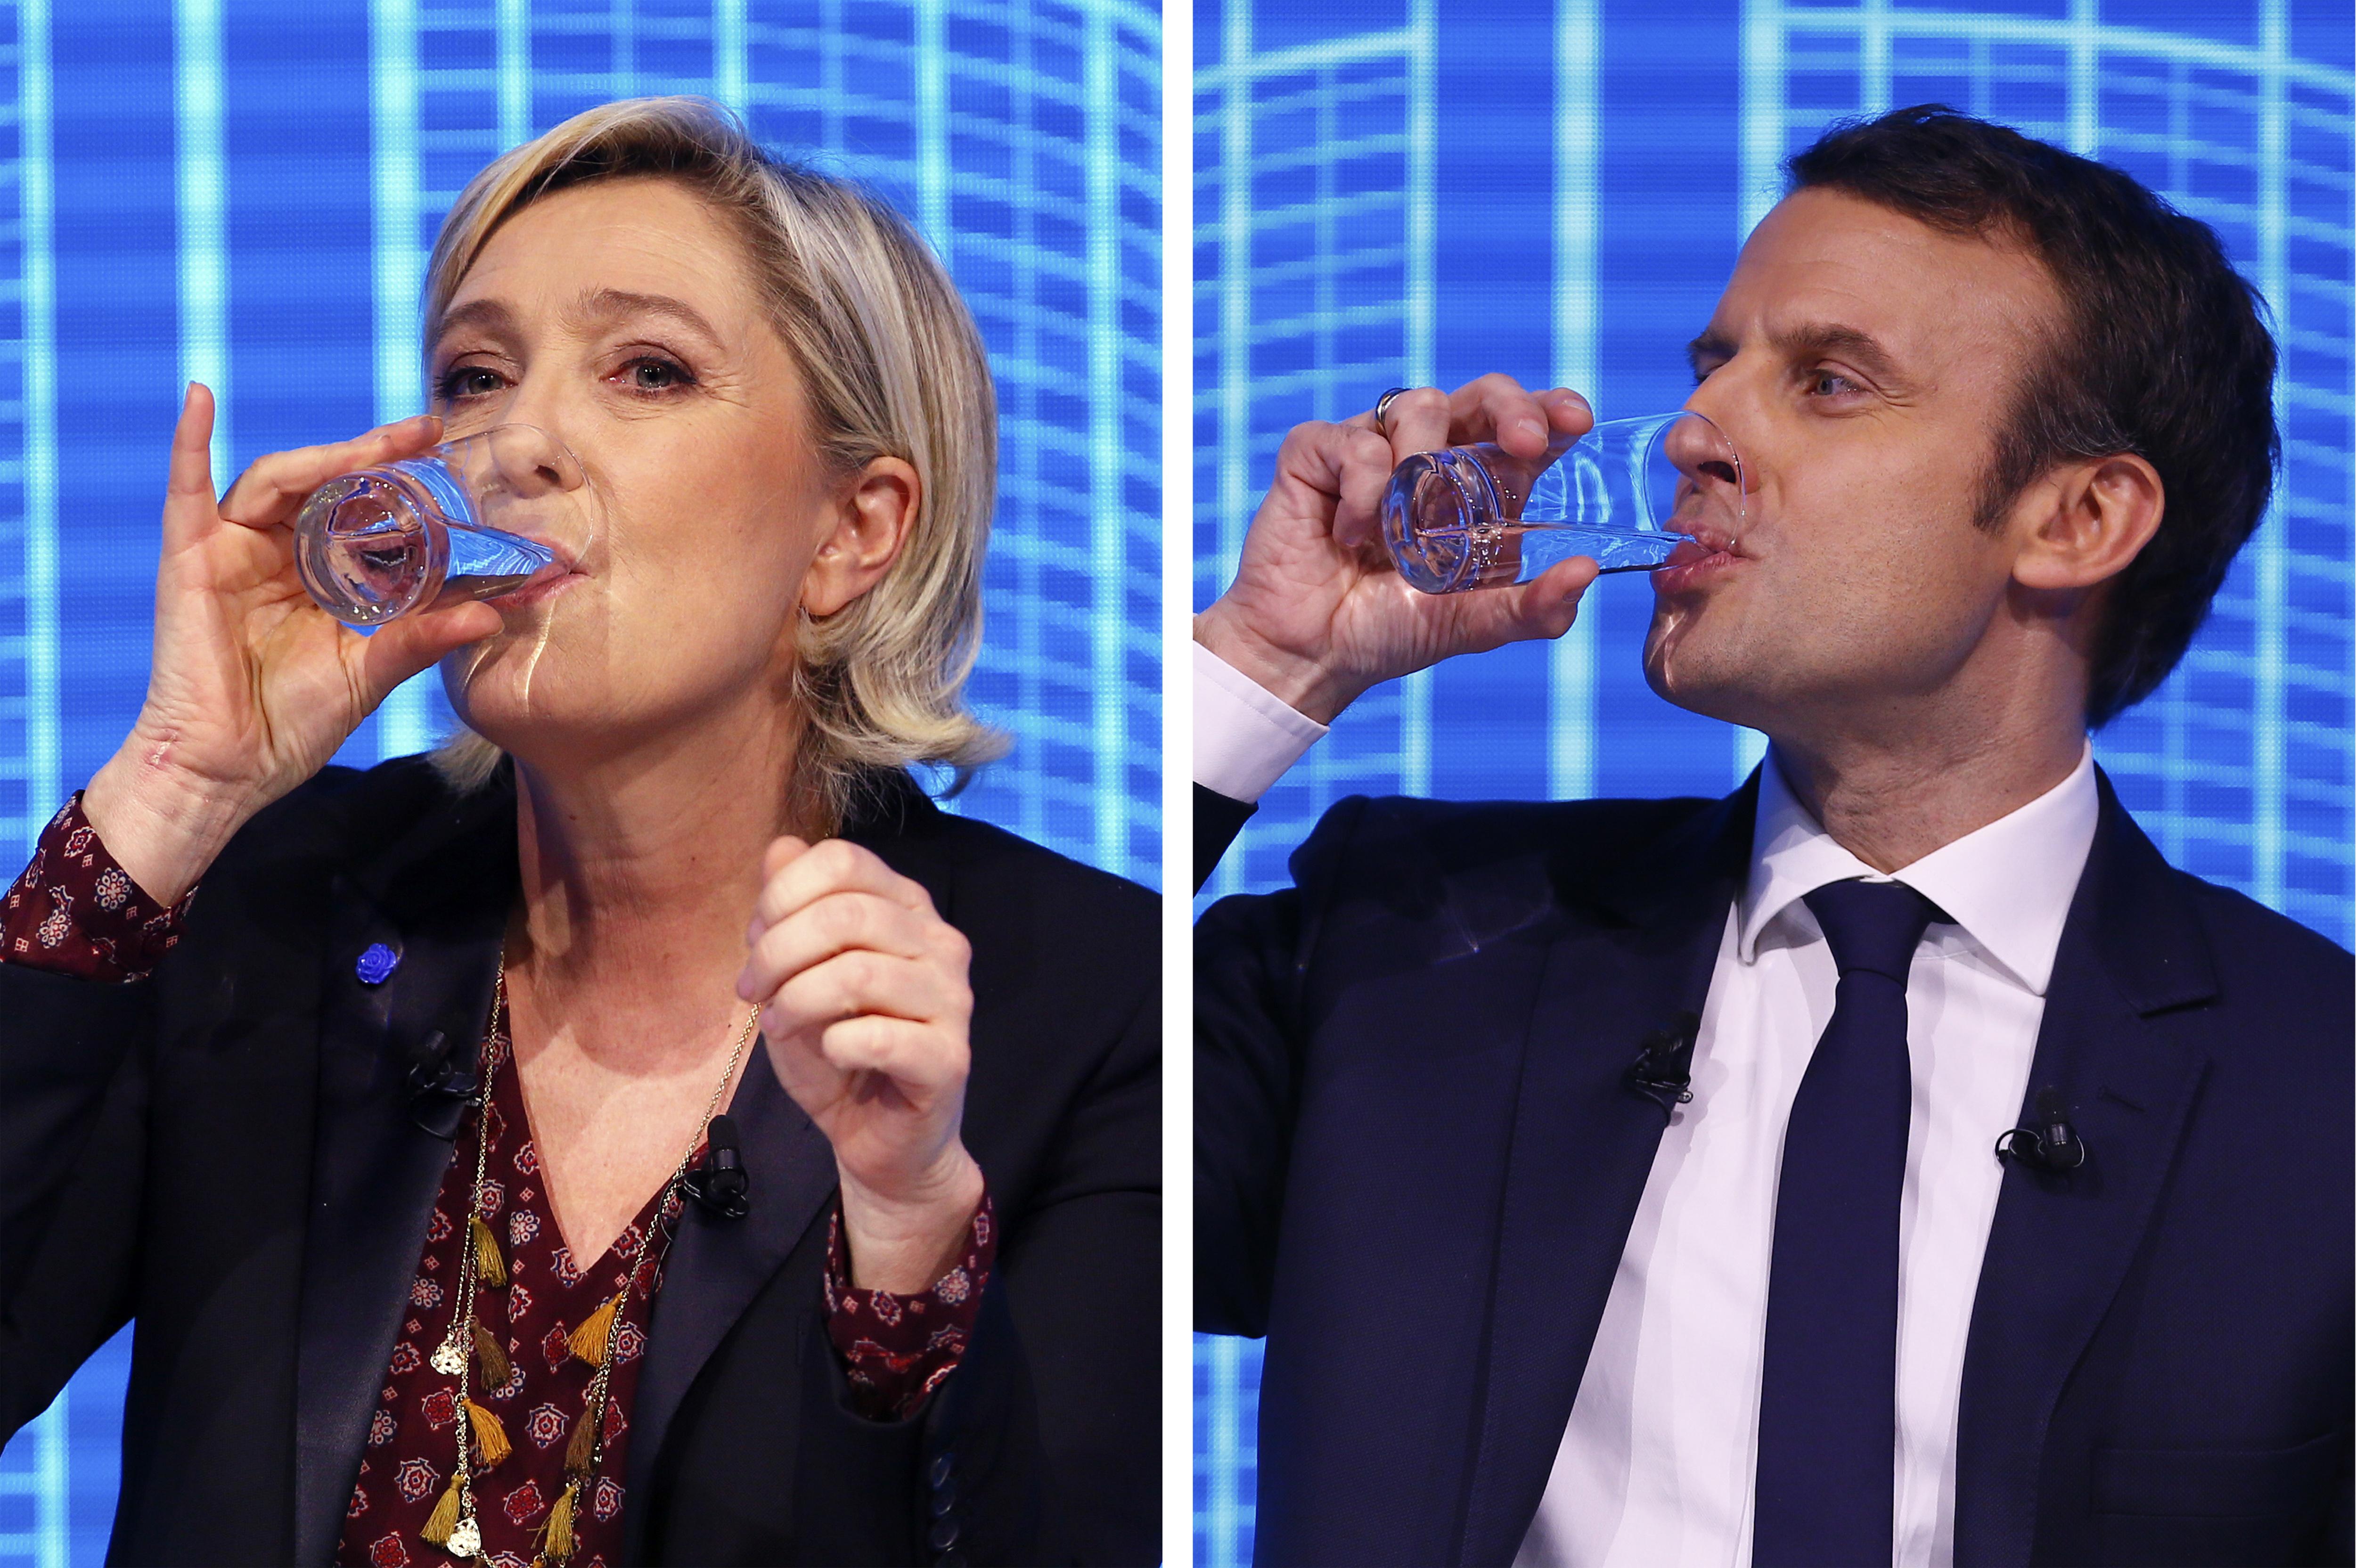 Marine Le Penová, Emmanuel Macron